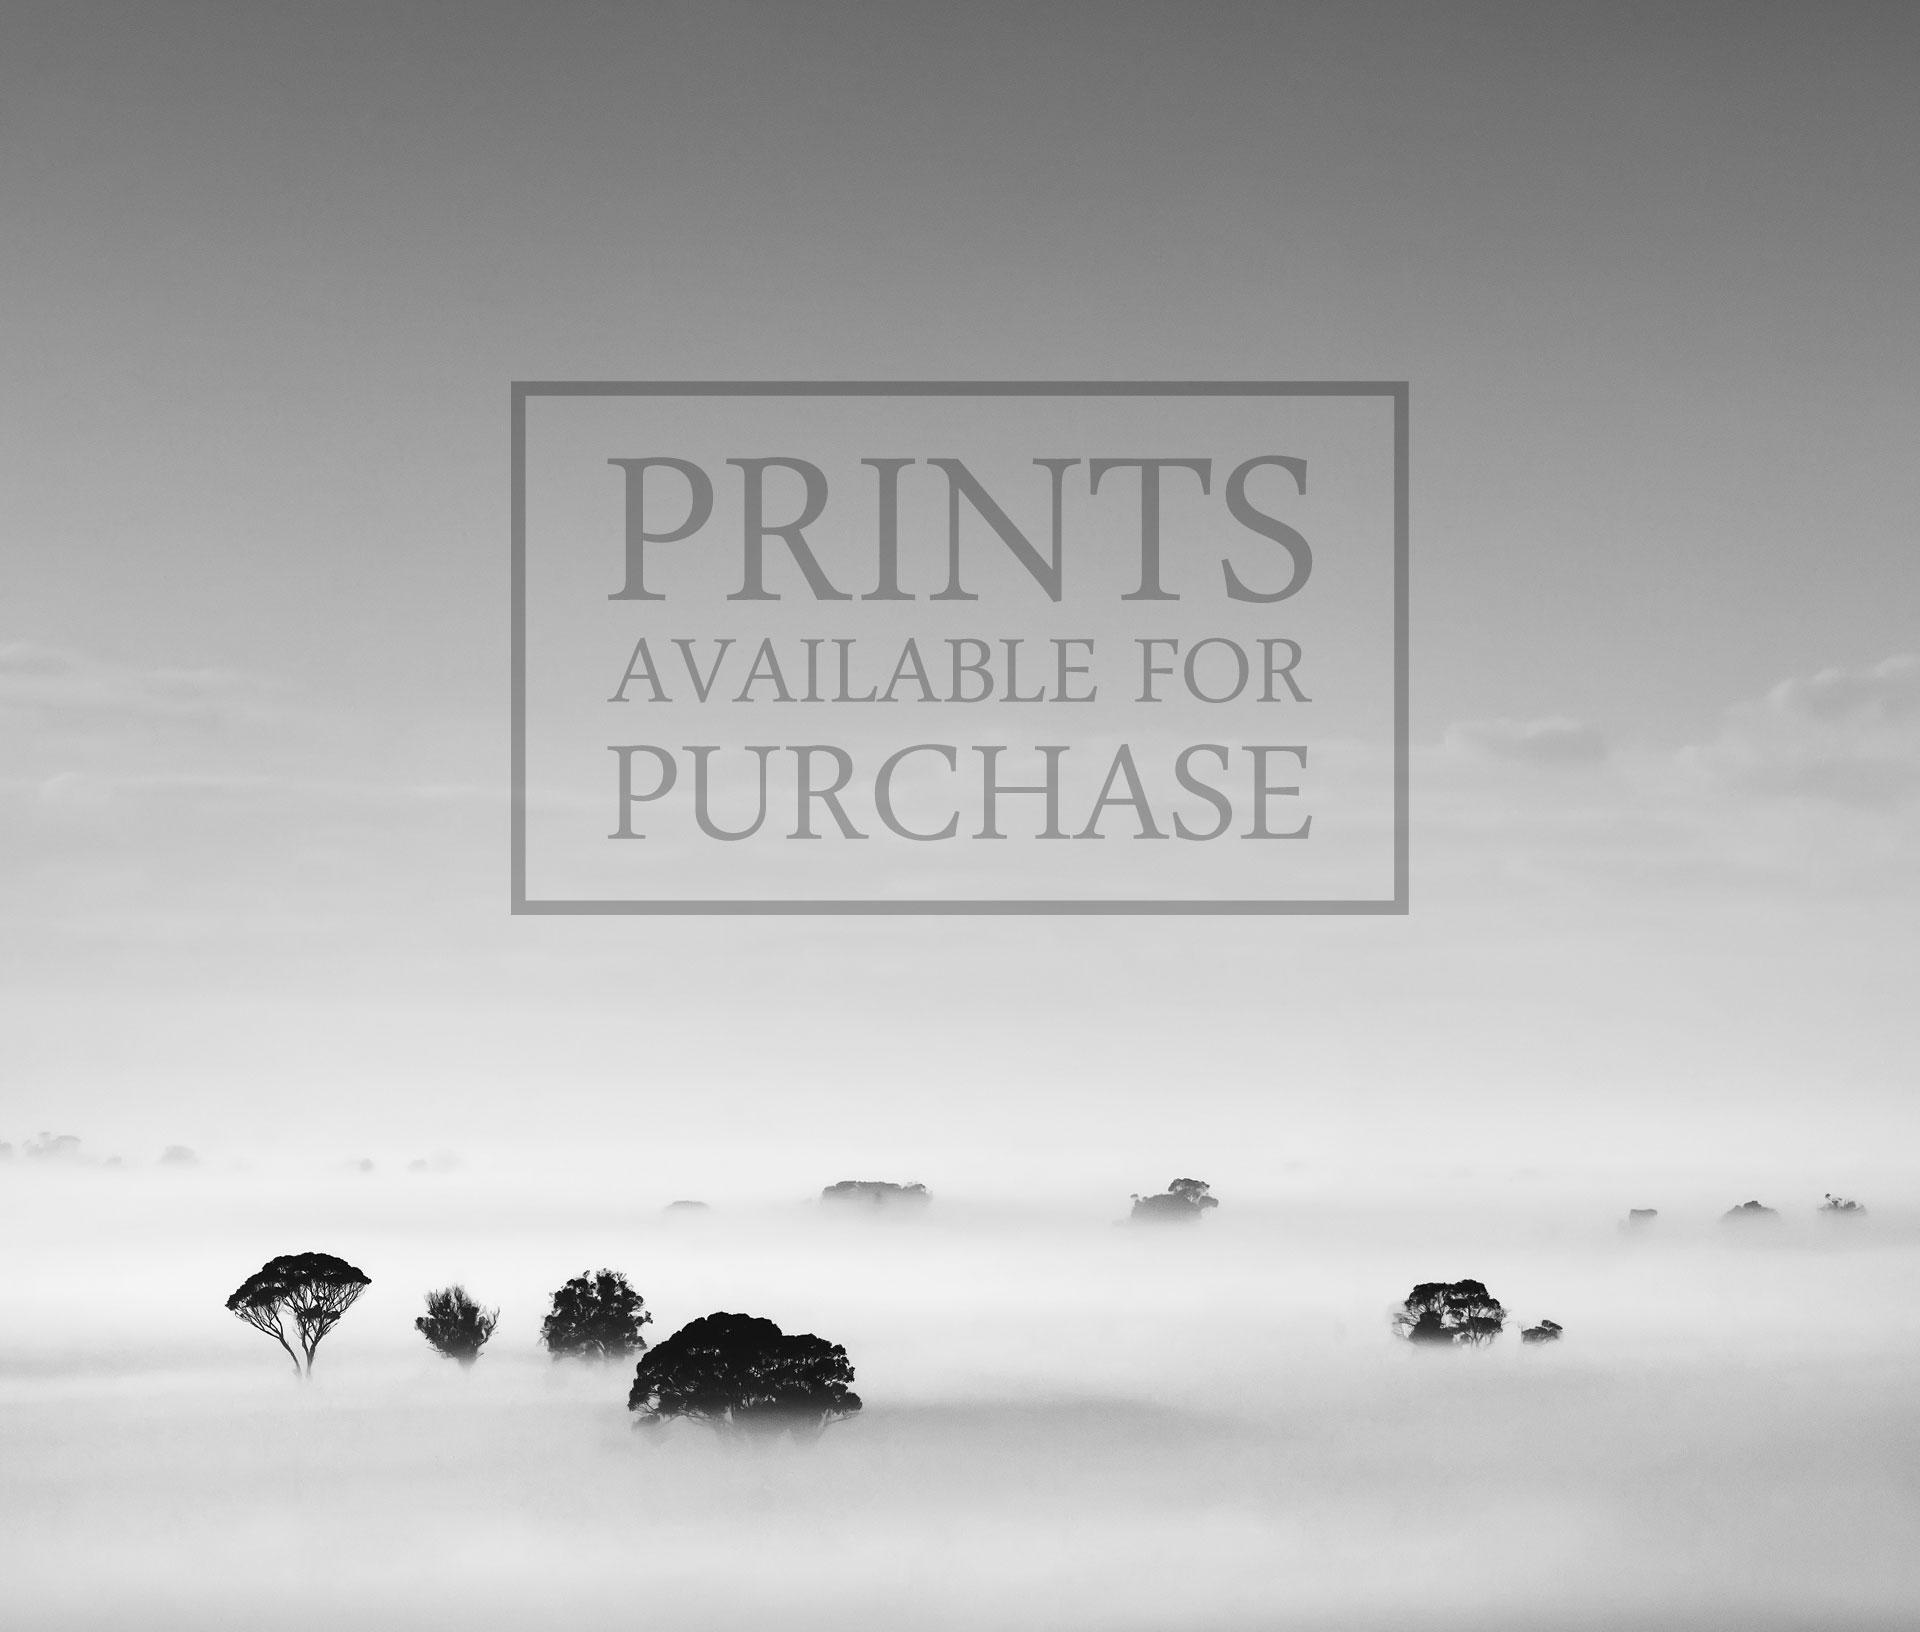 J.S.Parker Photography Print Store